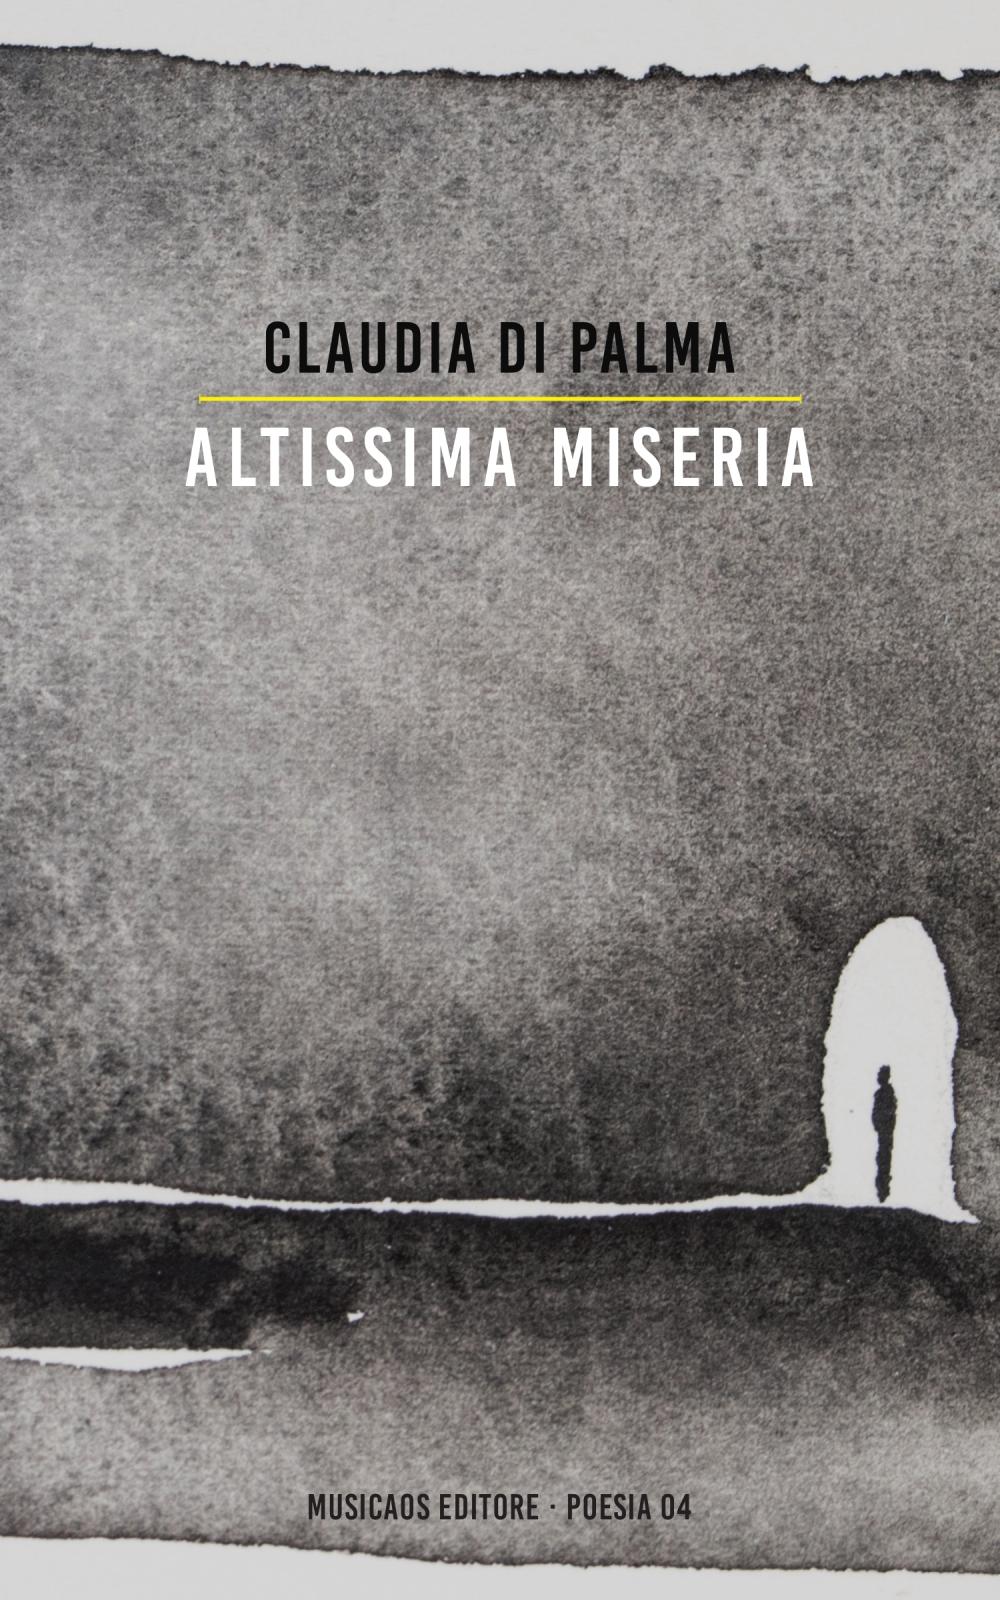 altissima-miseria-claudia-di-palma-musicaos-editore-poesia-04